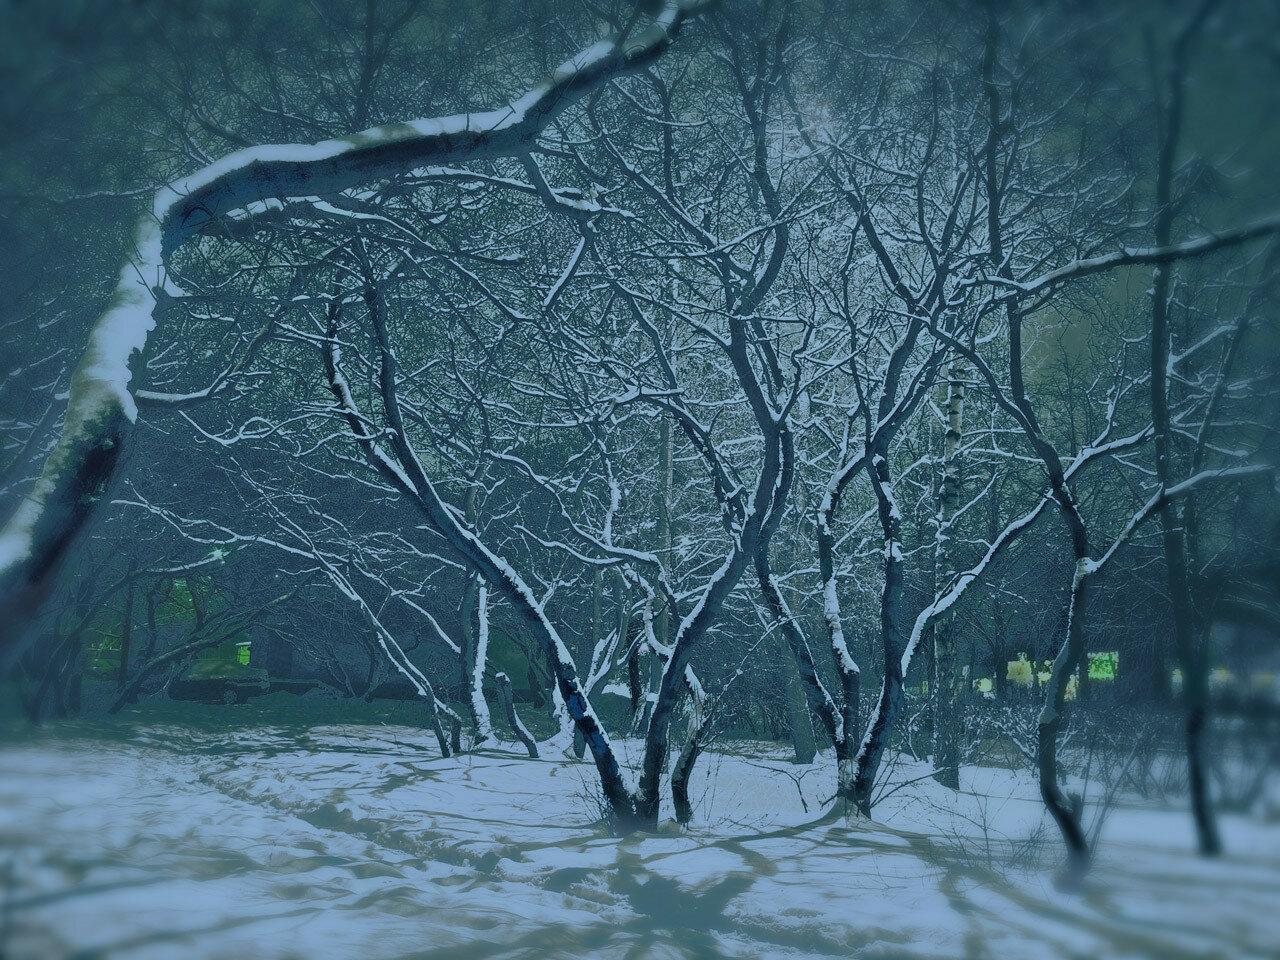 Синяя ночь. Автор фото: Юрий Семенов